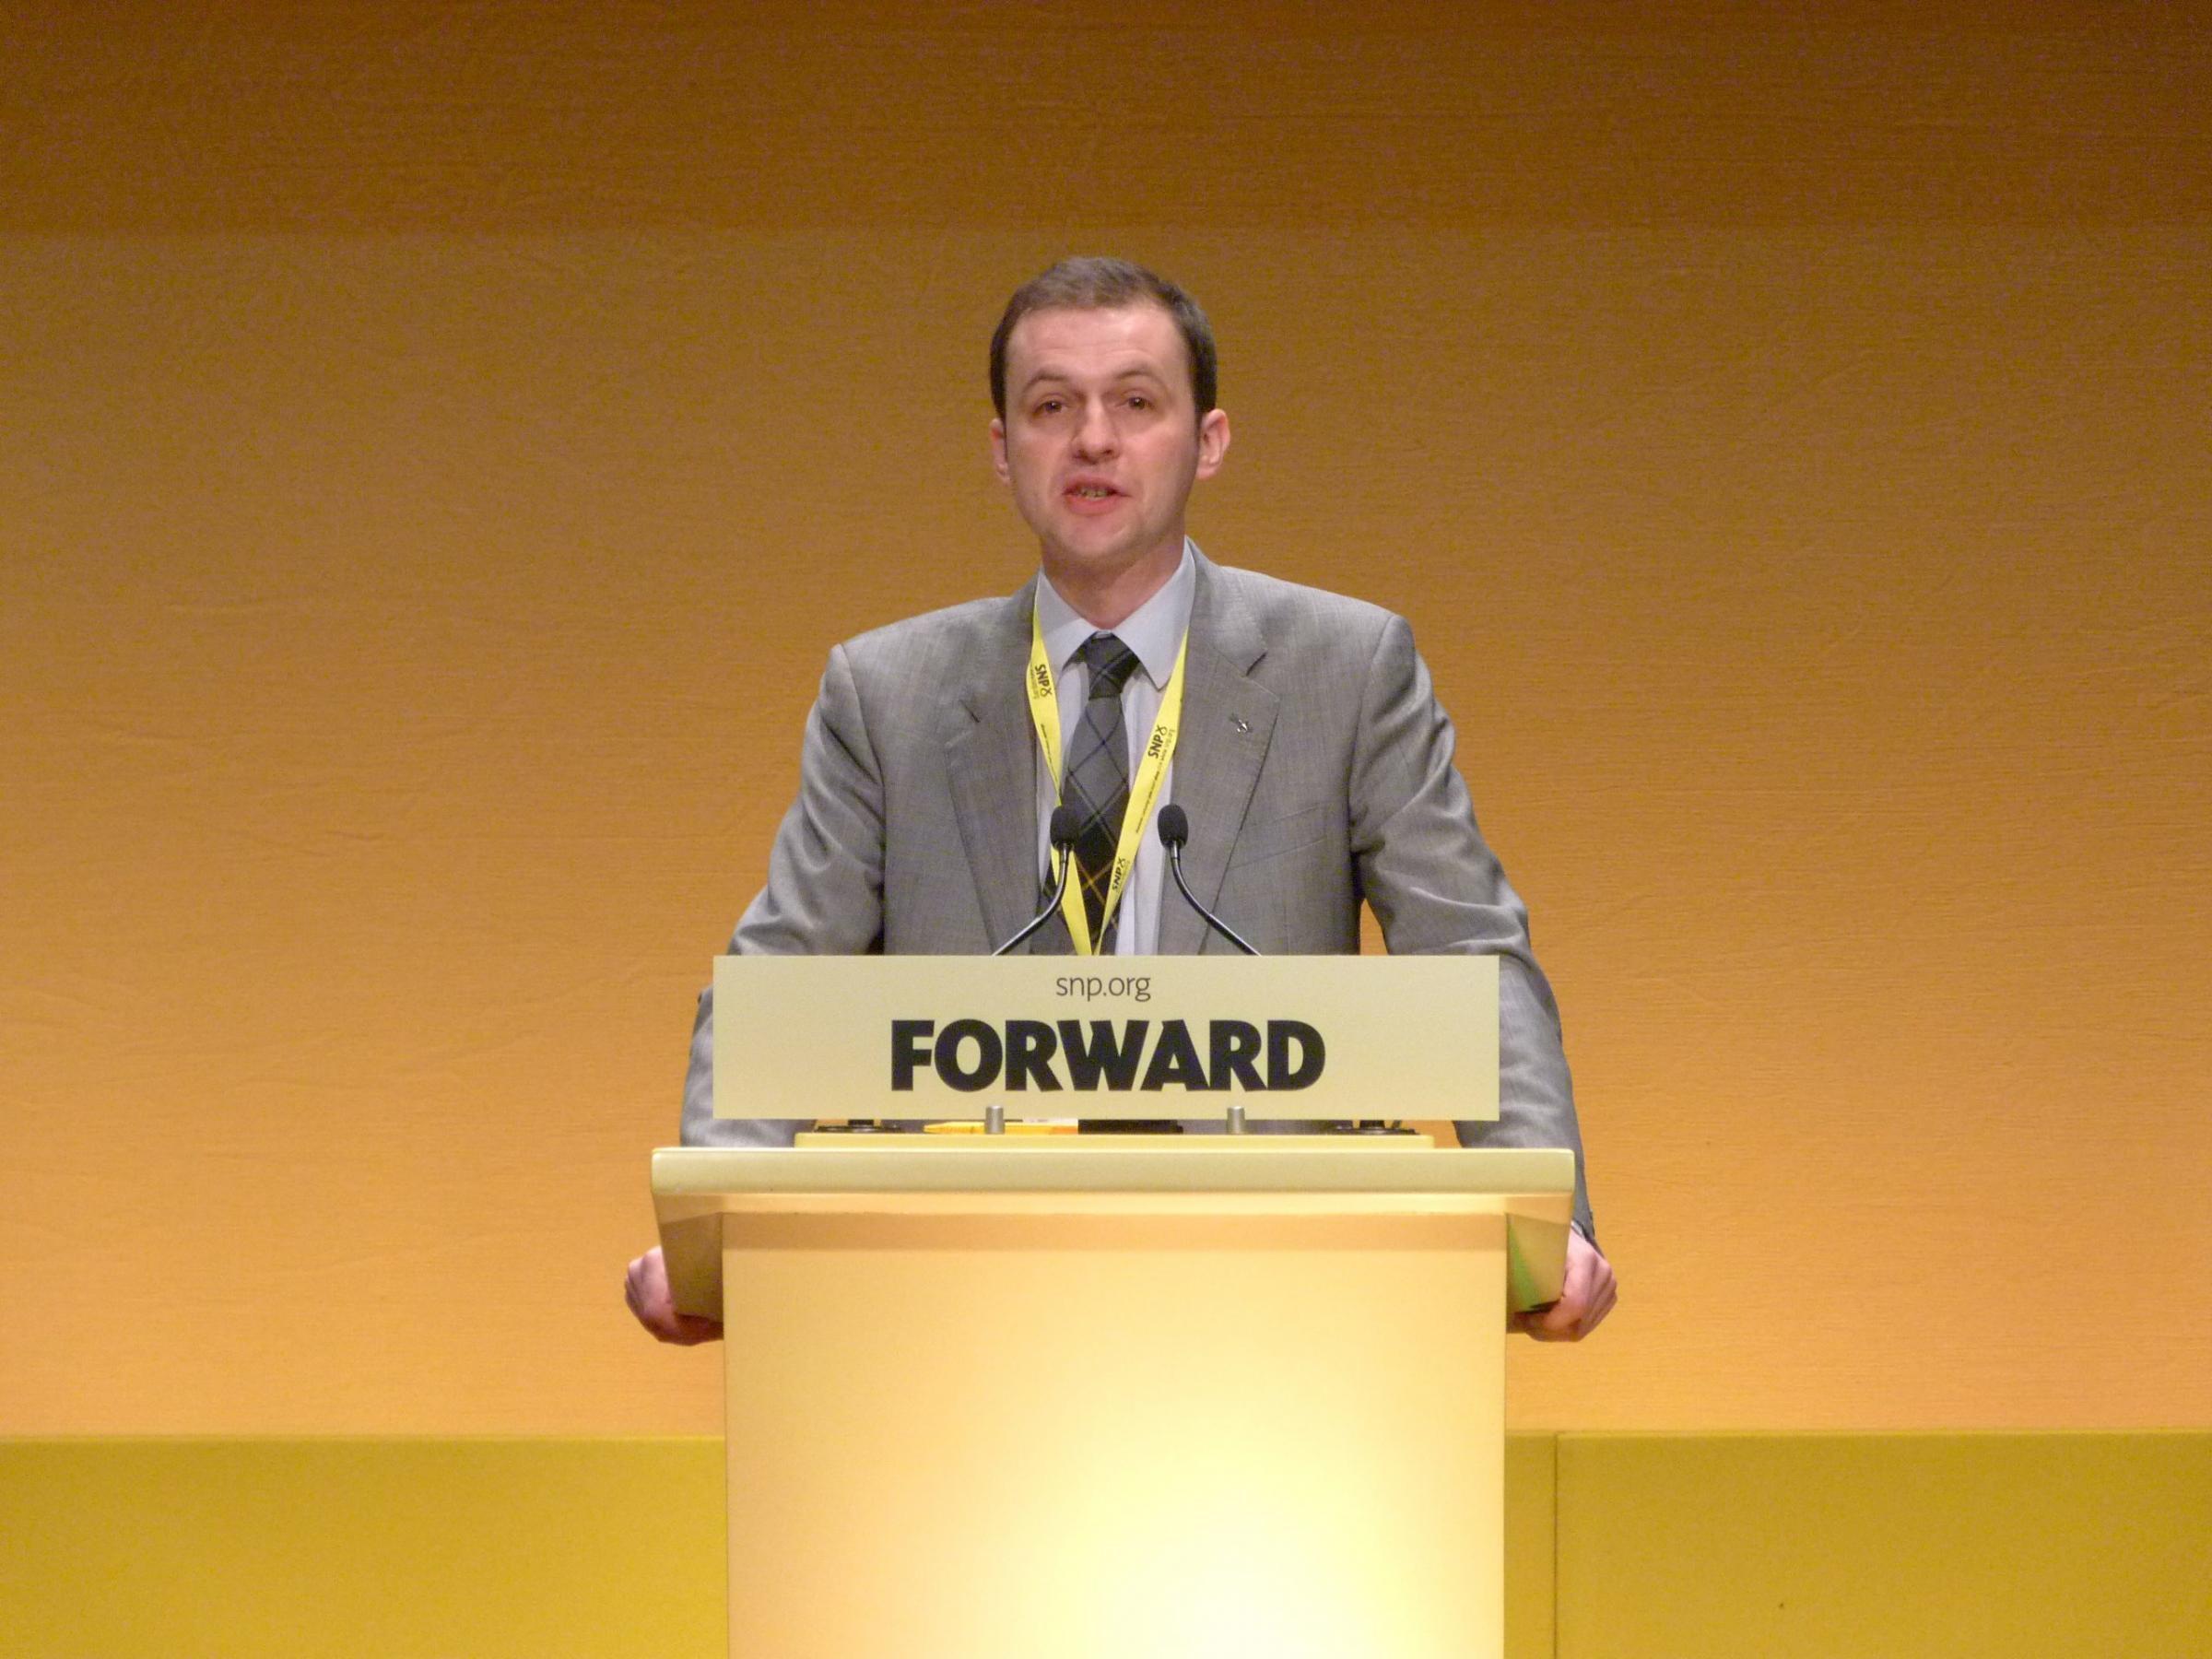 SNP warning of 'sheer havoc' following No-Deal Brexit leak